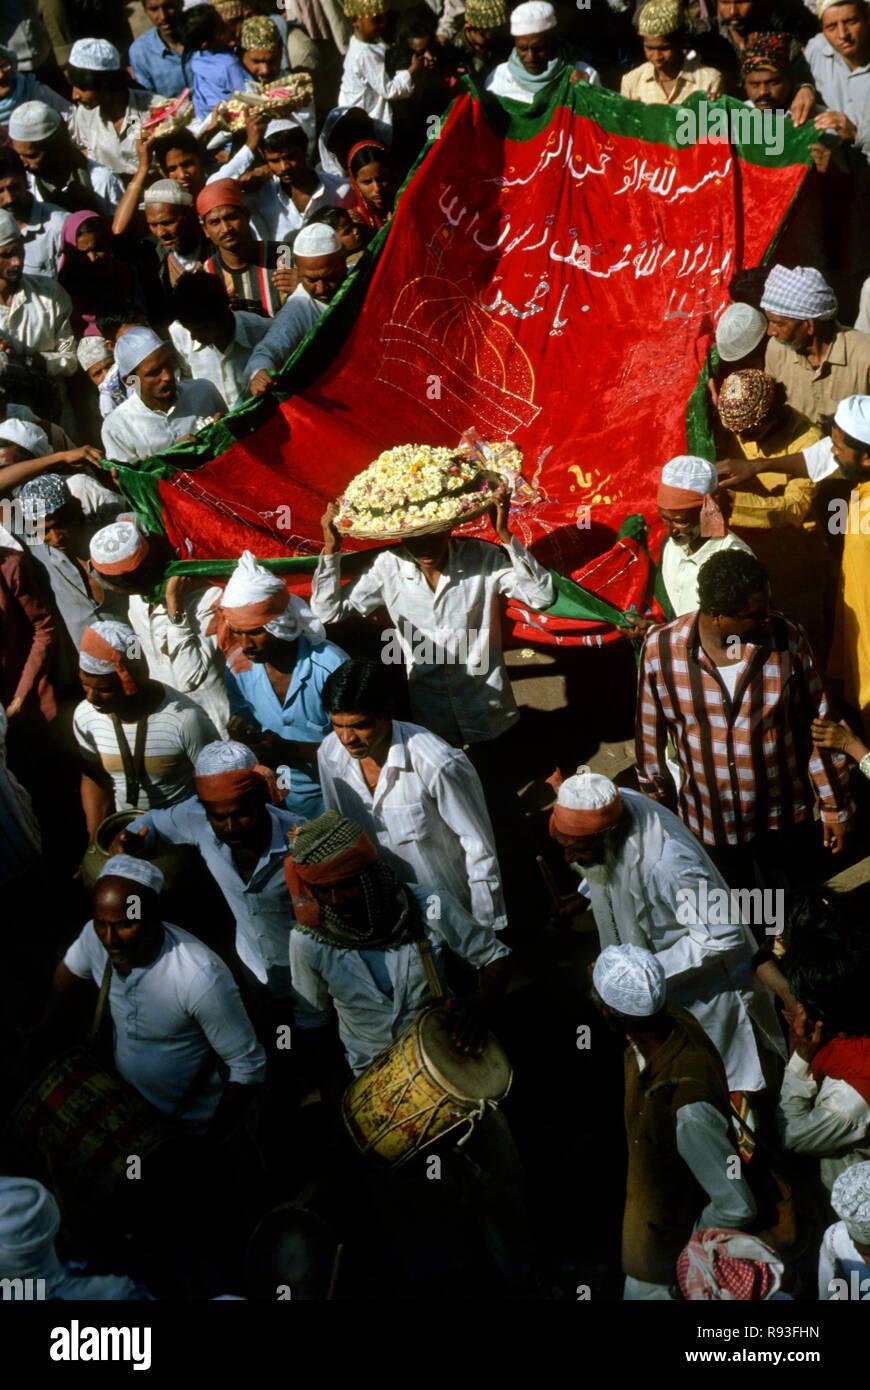 L'islam celebrazione, ajmer, Rajasthan, India Immagini Stock